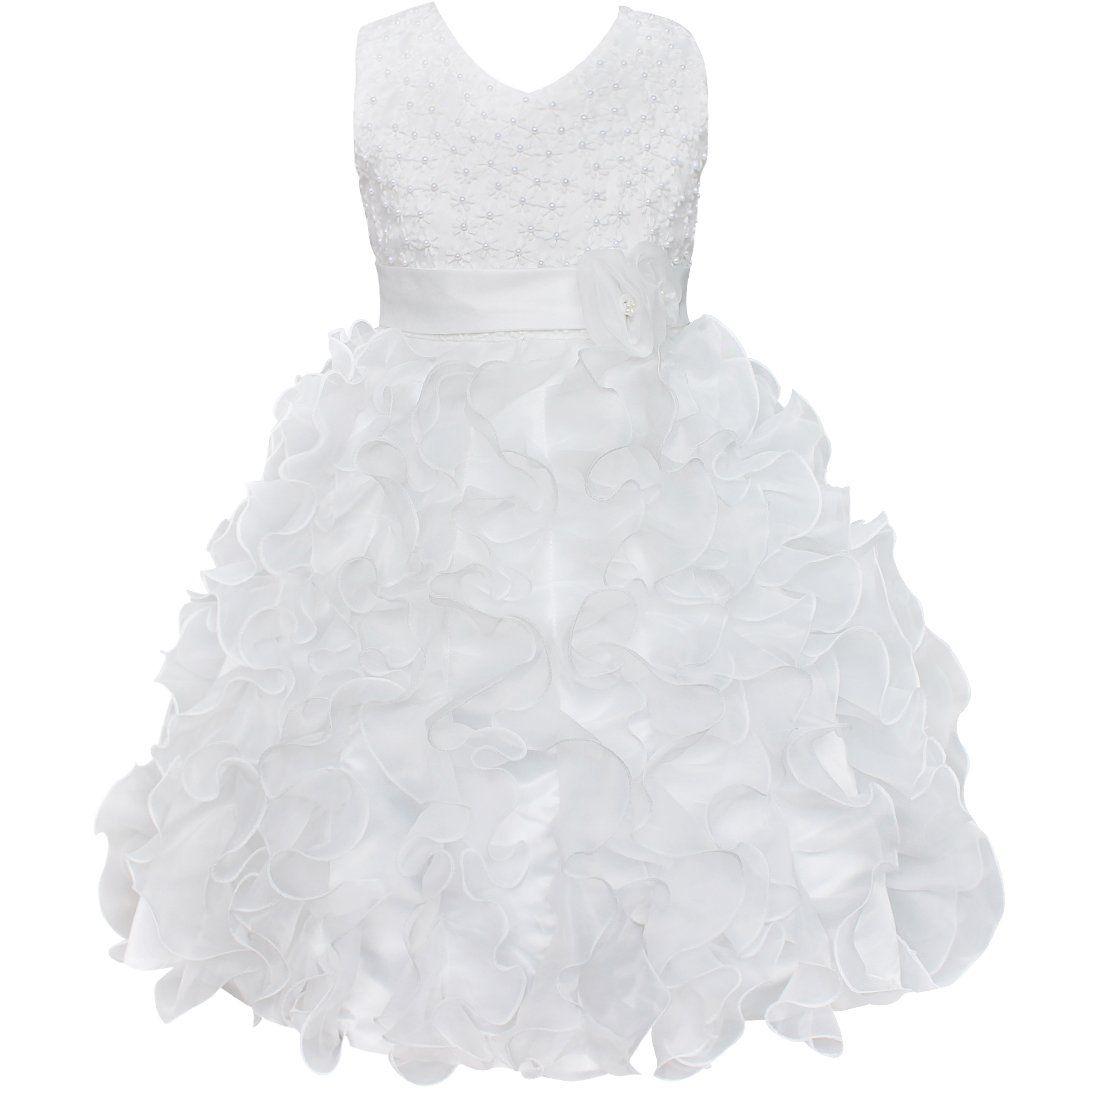 Robe princesse fille mariage amazon